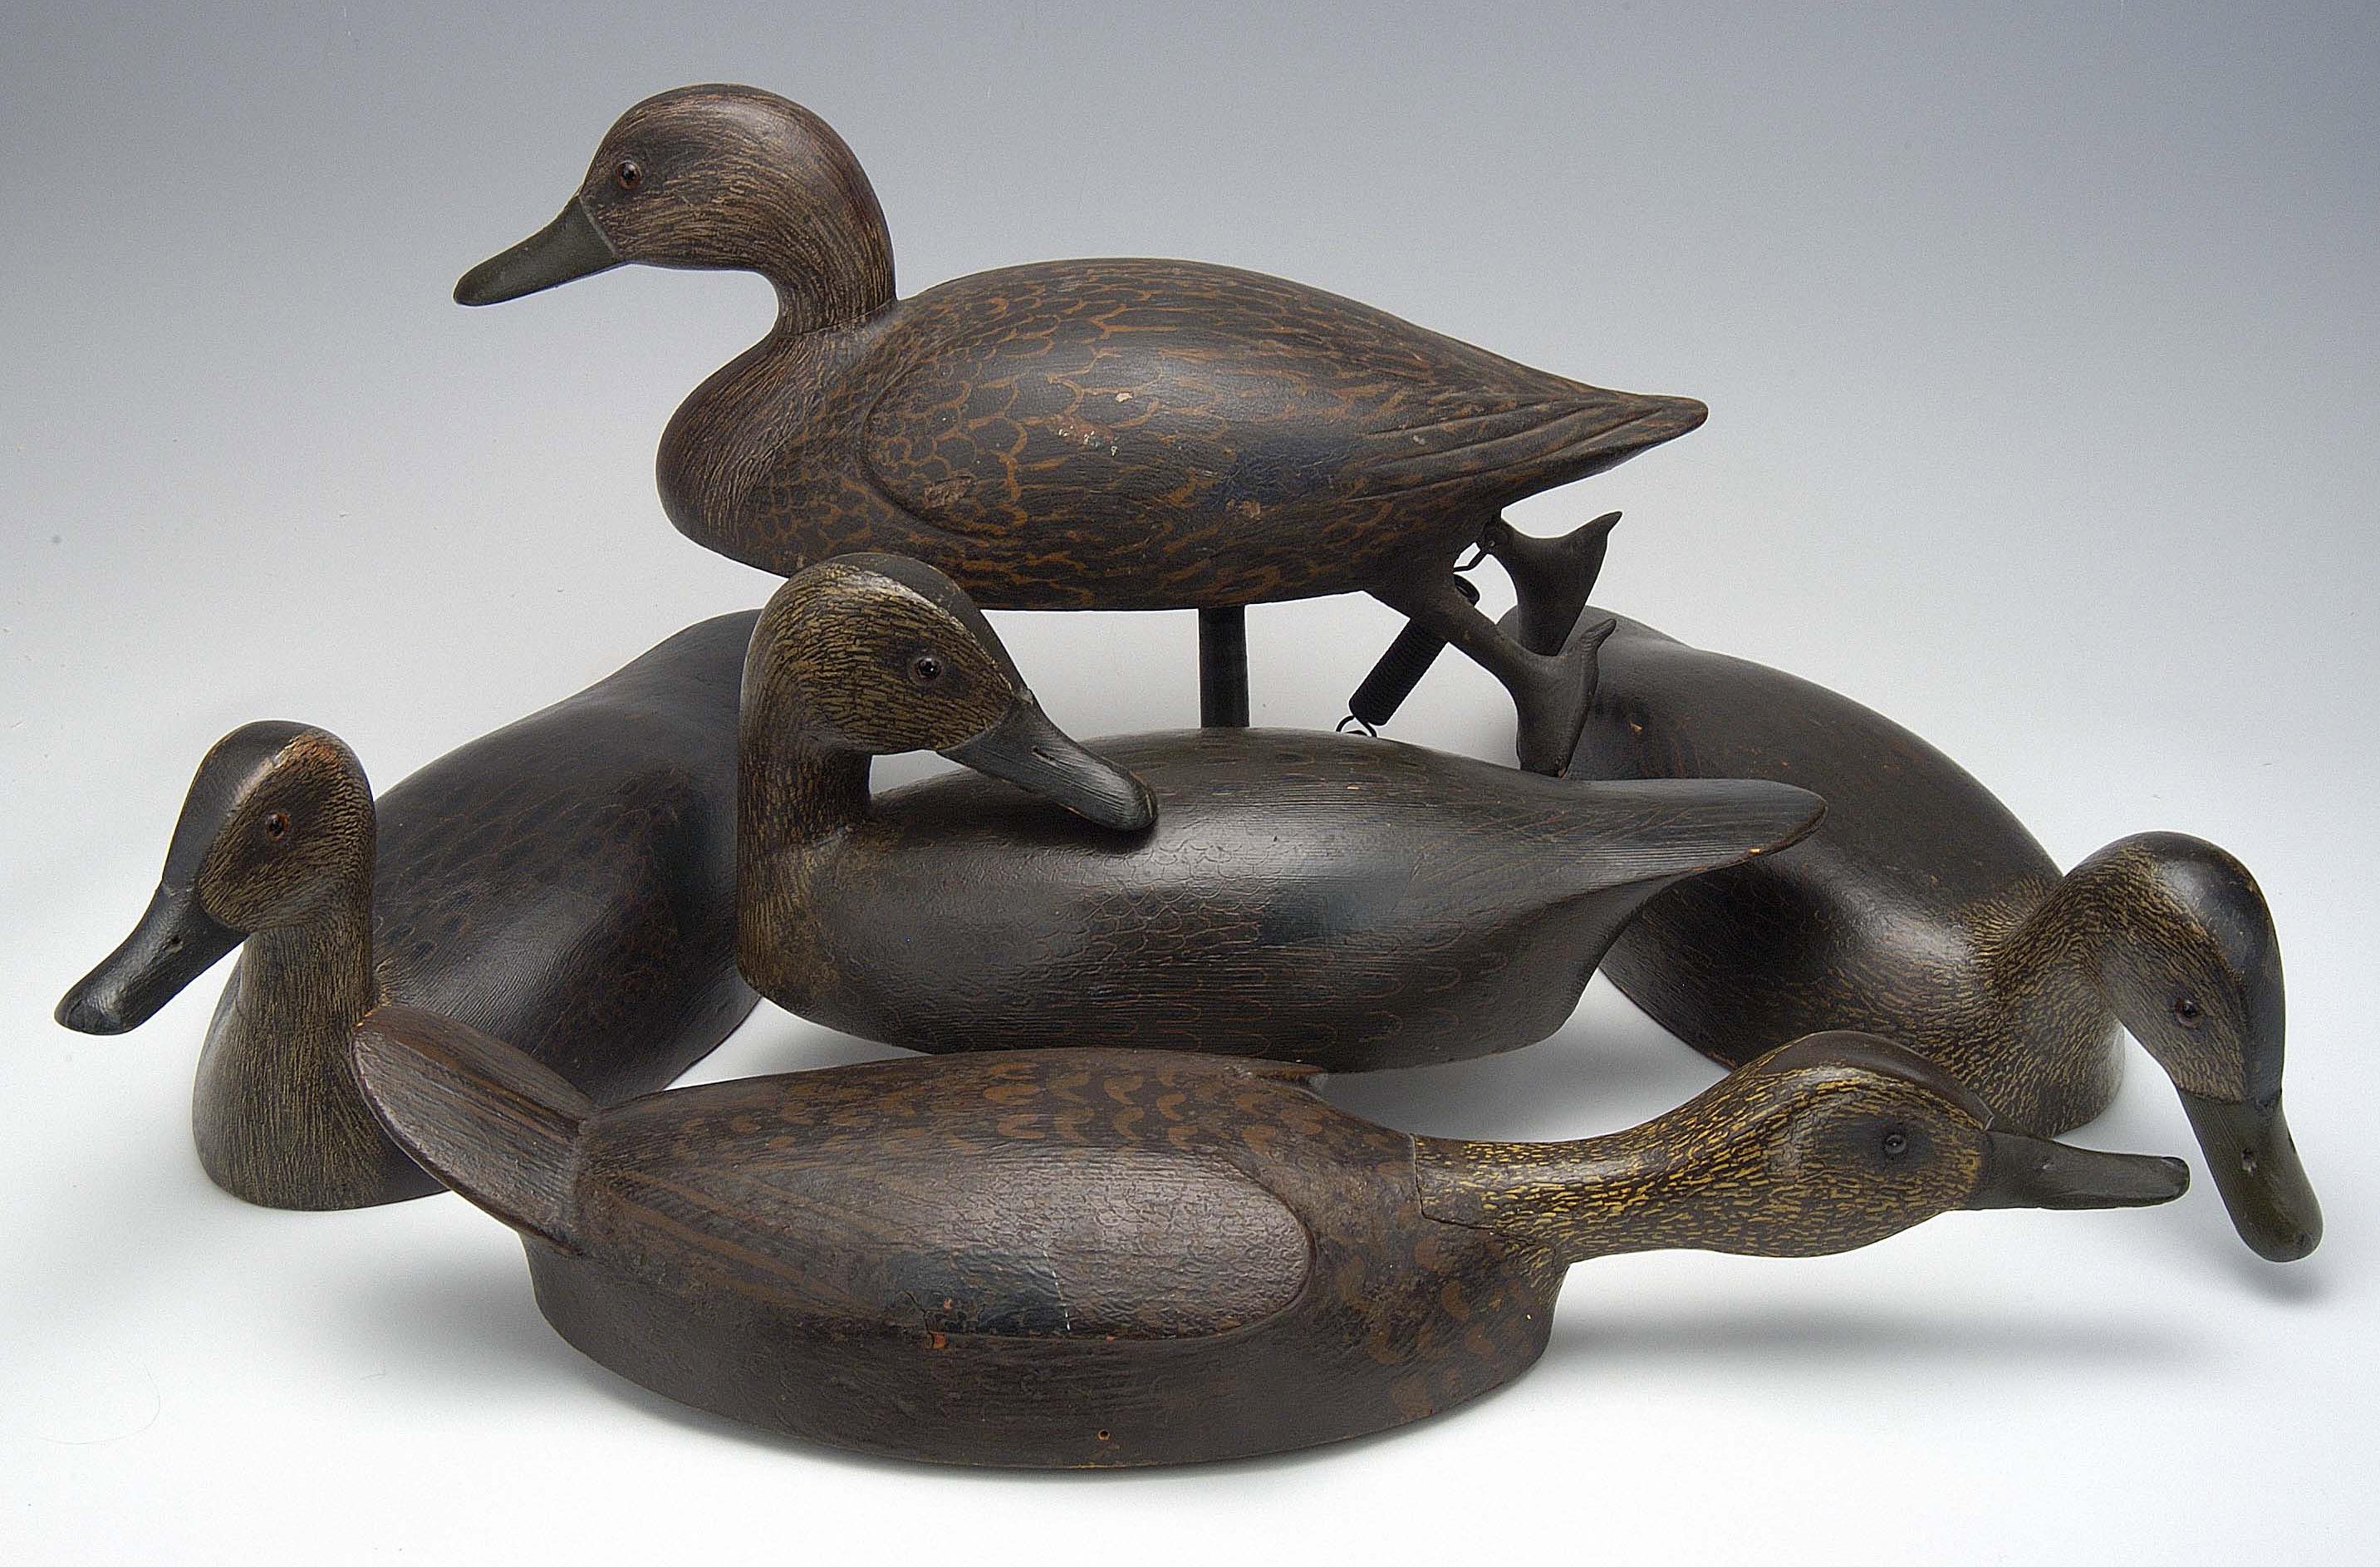 Antique hunting decoys